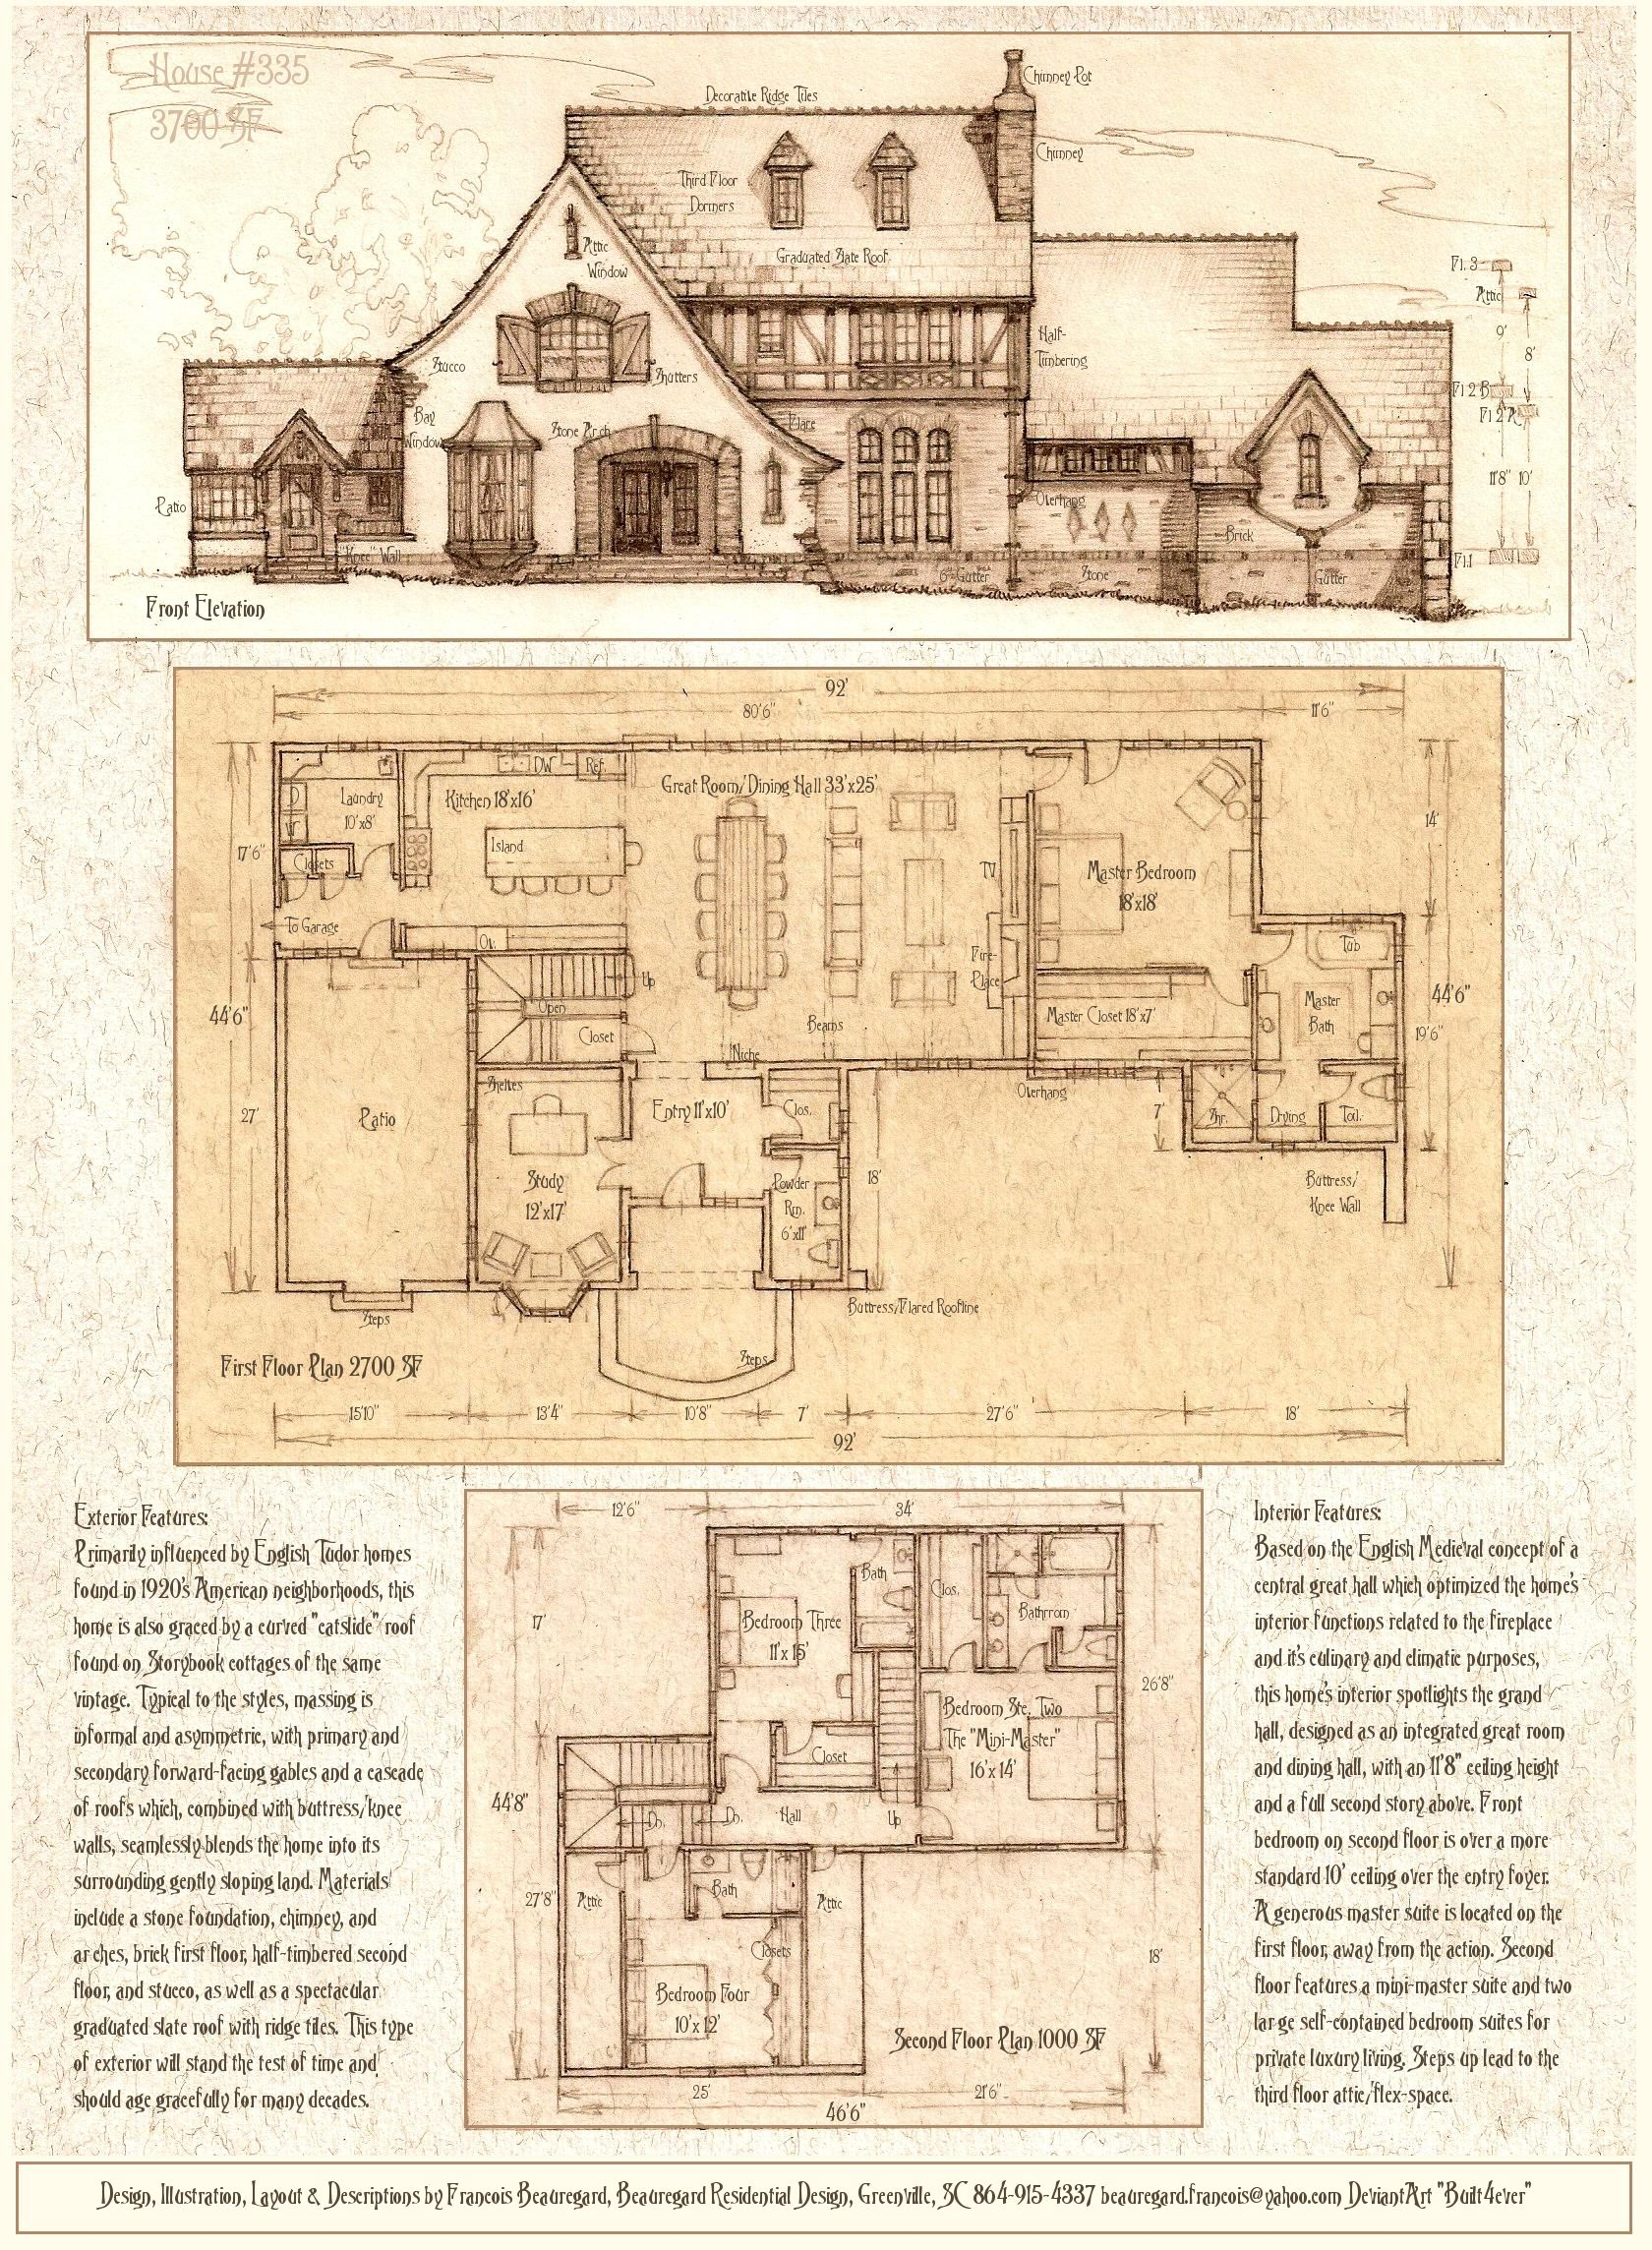 orig11.deviantart.net cabf f 2014 161 d 8 house_335__a_tudor_storybook_luxury_home_by_built4ever-d3cs1lh.jpg